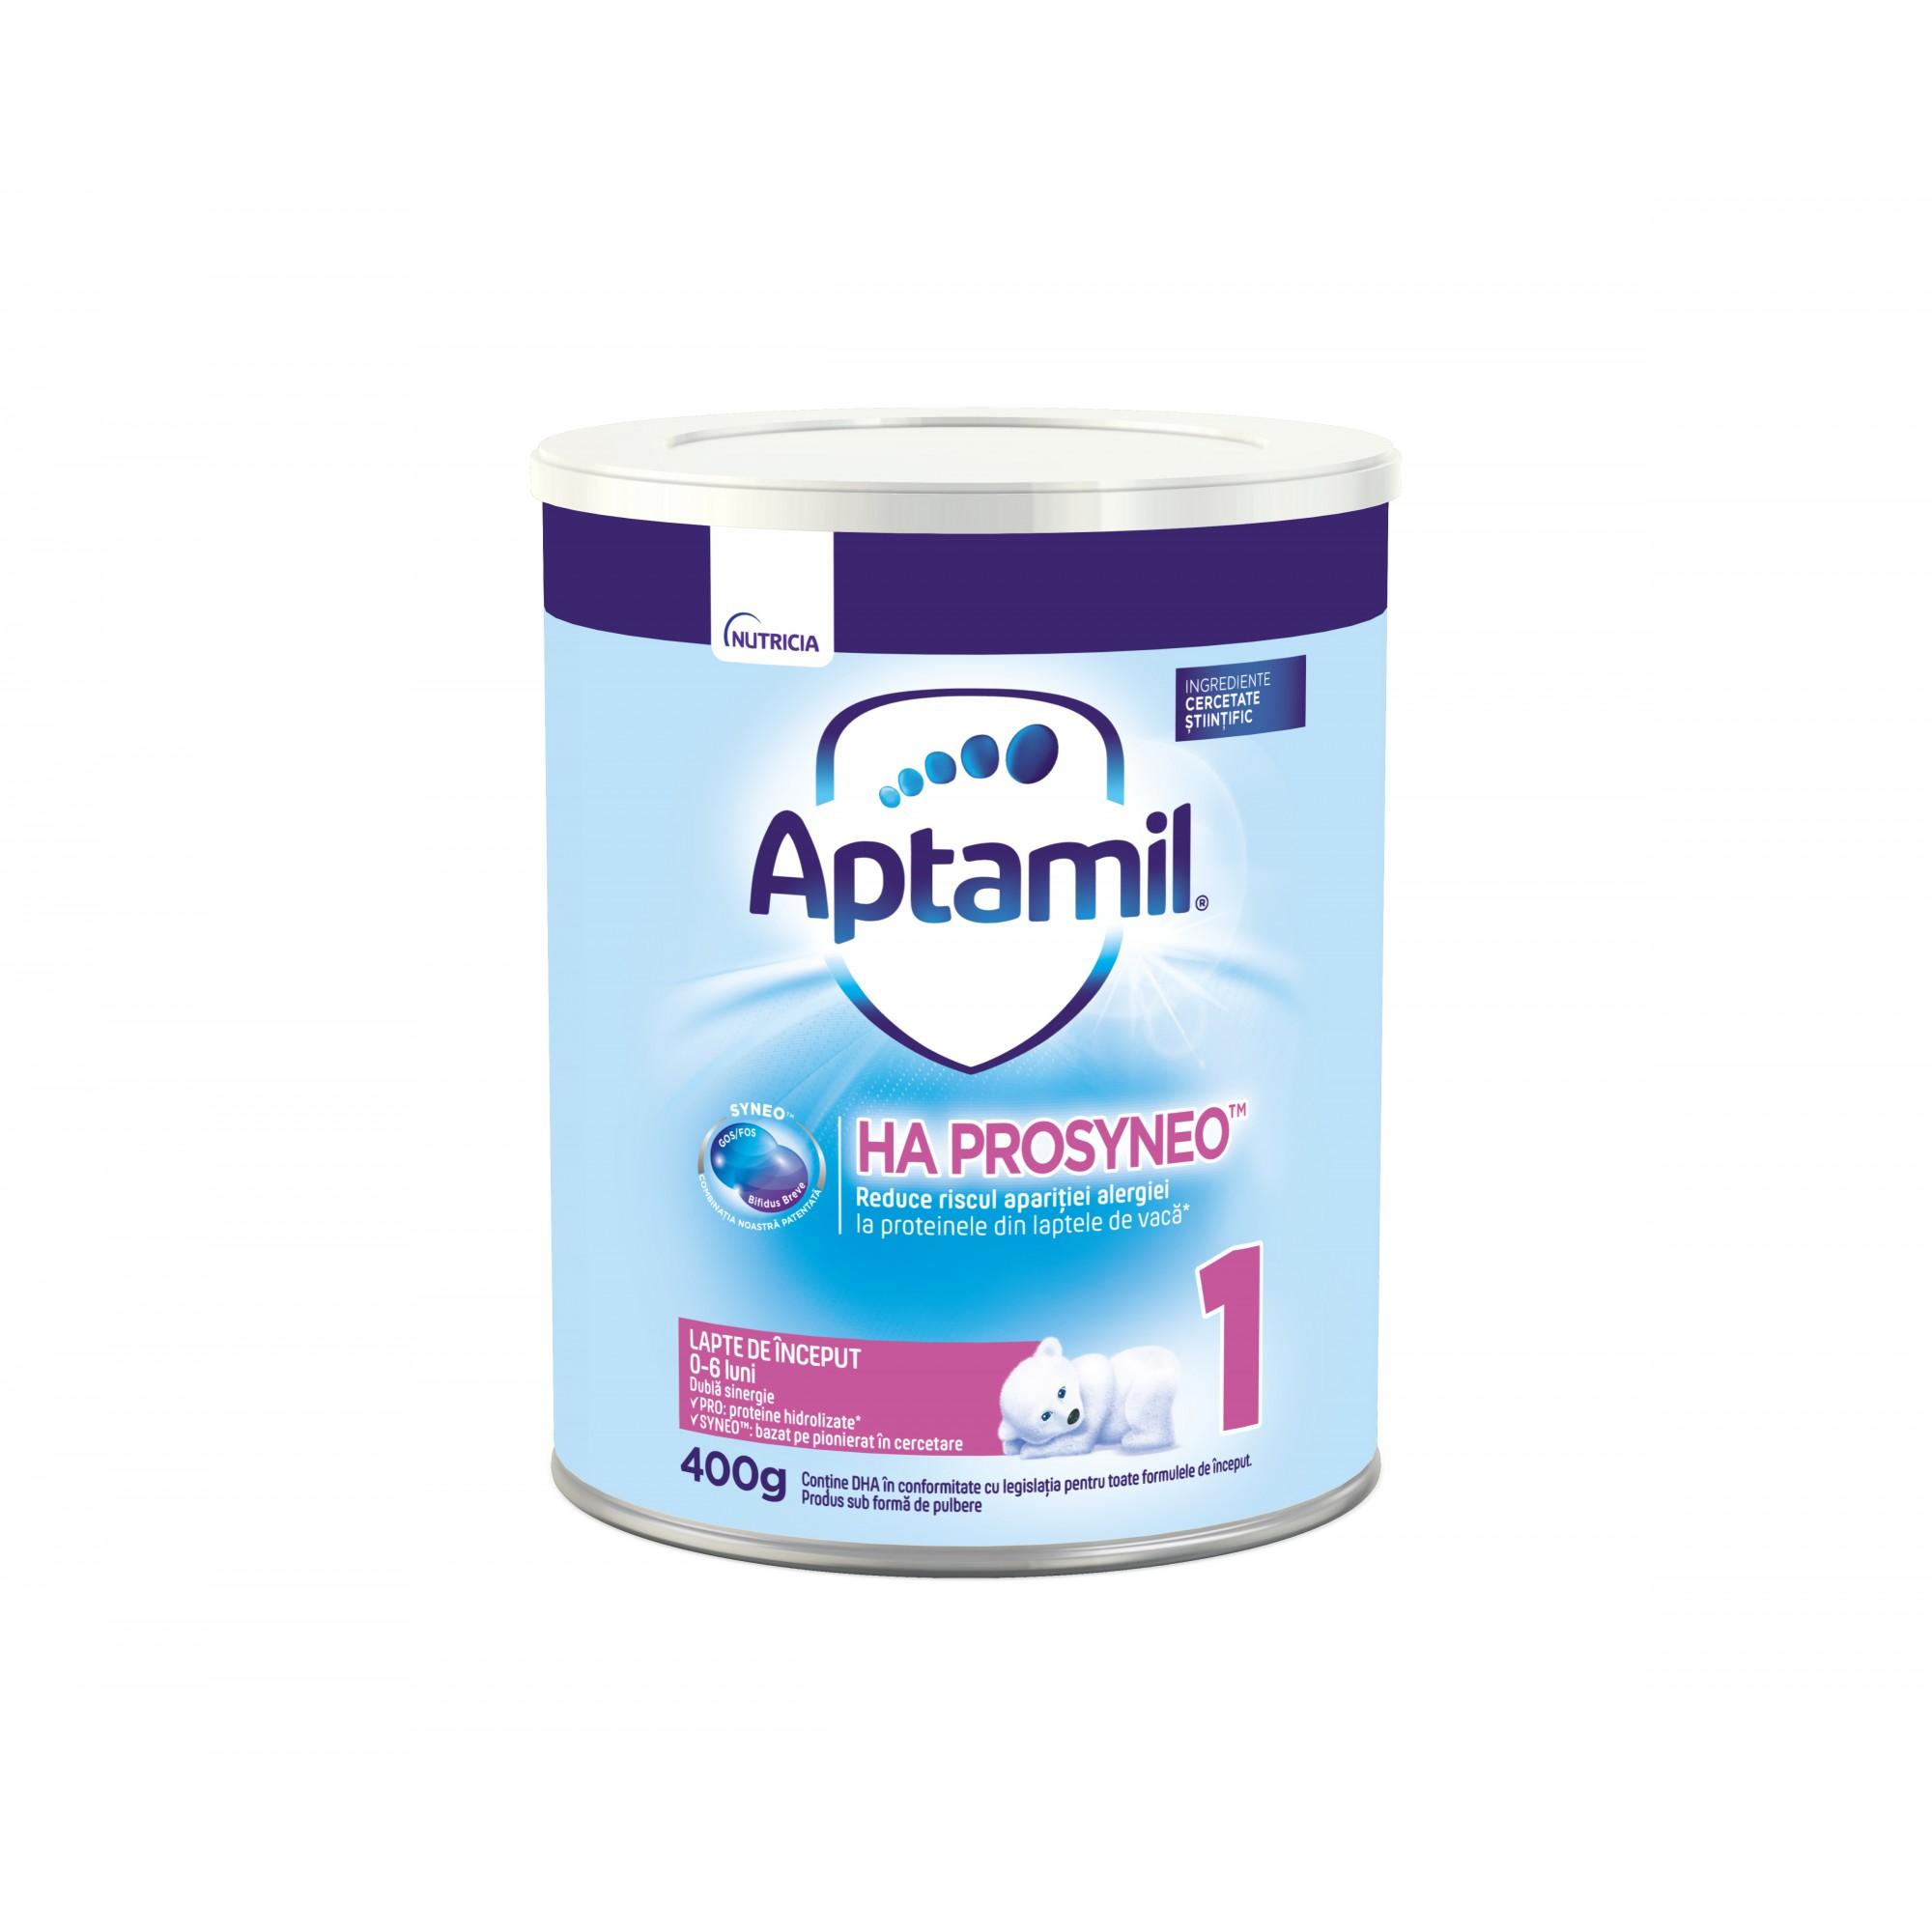 Lapte de inceput Nutricia, Aptamil HA1 Prosyneo, 400g